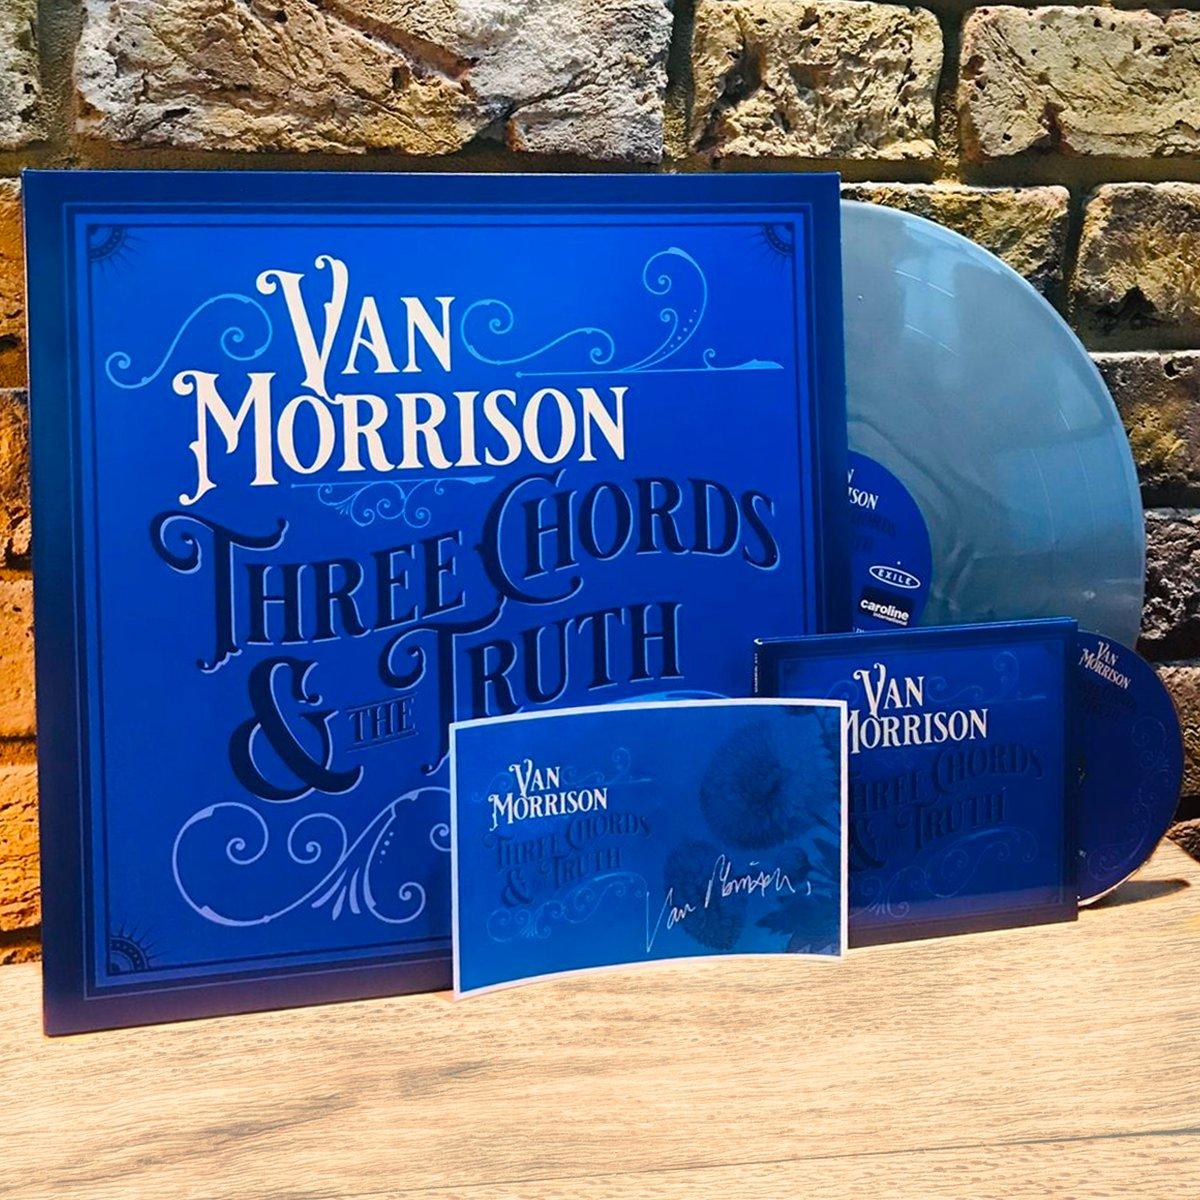 "Van Morrison on Twitter ""Order your copy of Van Morrison's 'Three ..."